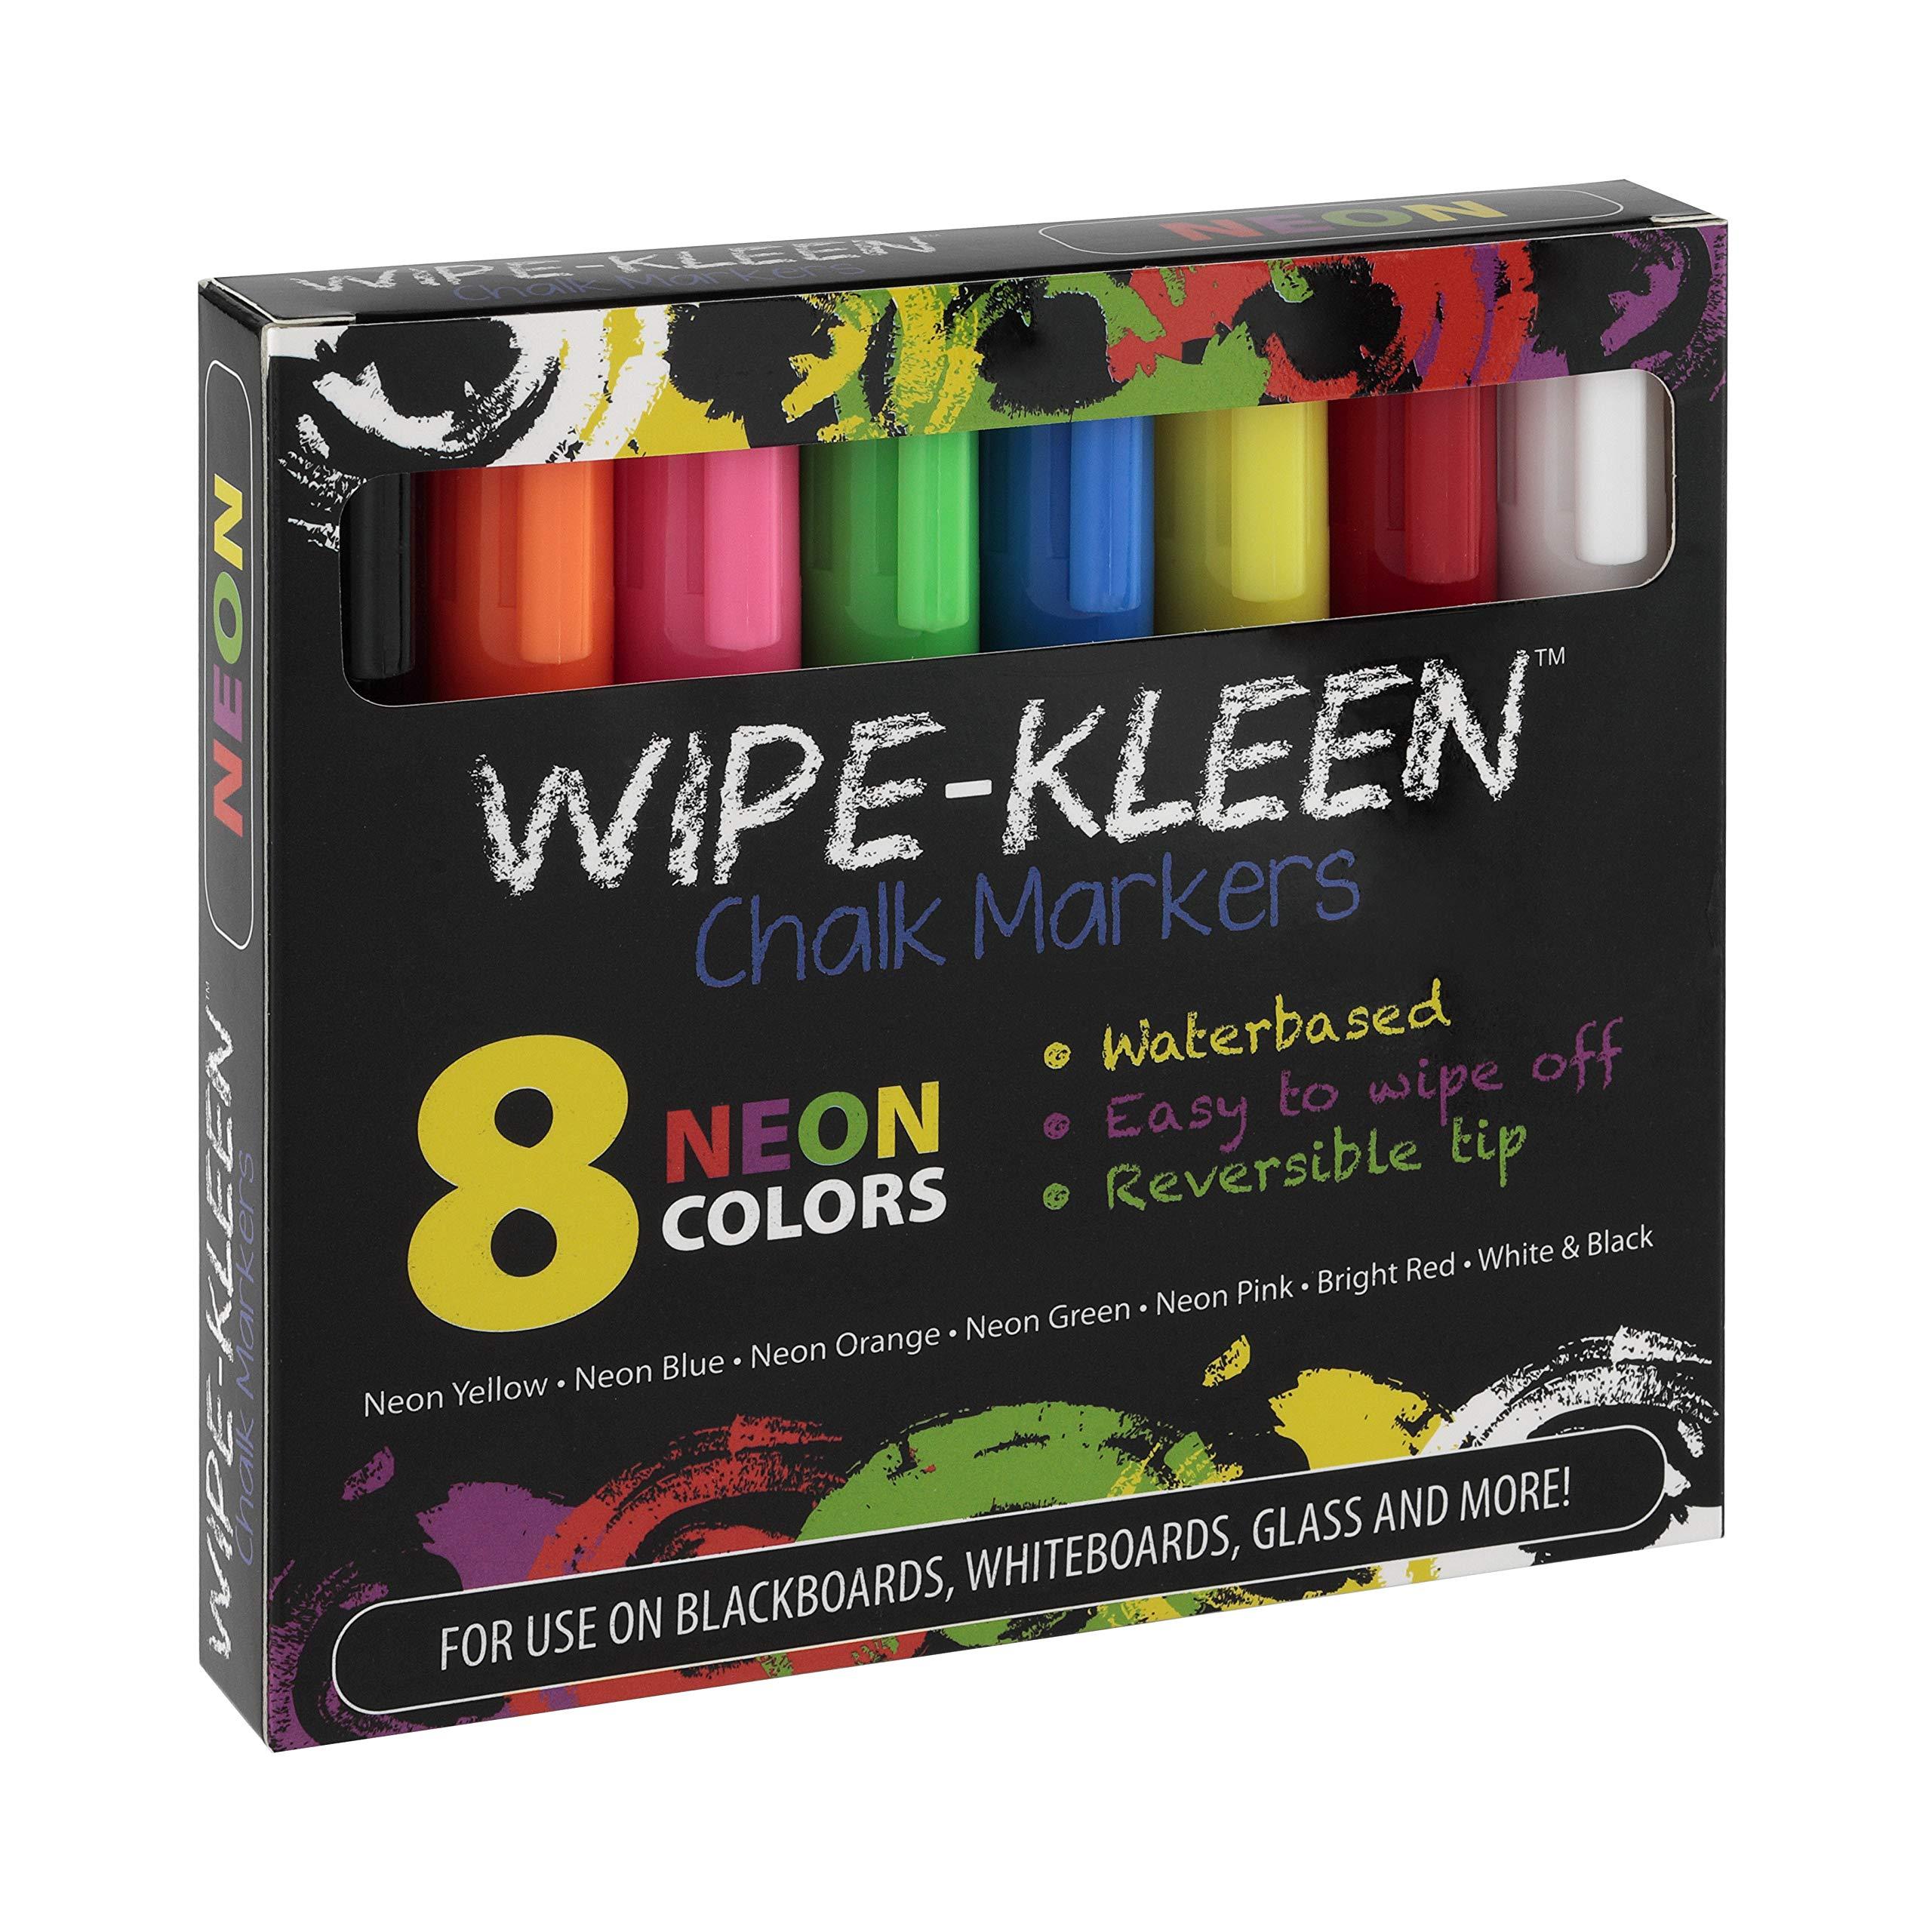 Wipe-Kleen Liquid Chalk Board Window Markers Set - Set of 8 Erasable Pens for Chalkboard Non Toxic NEON Set of 8 by Creative Mark